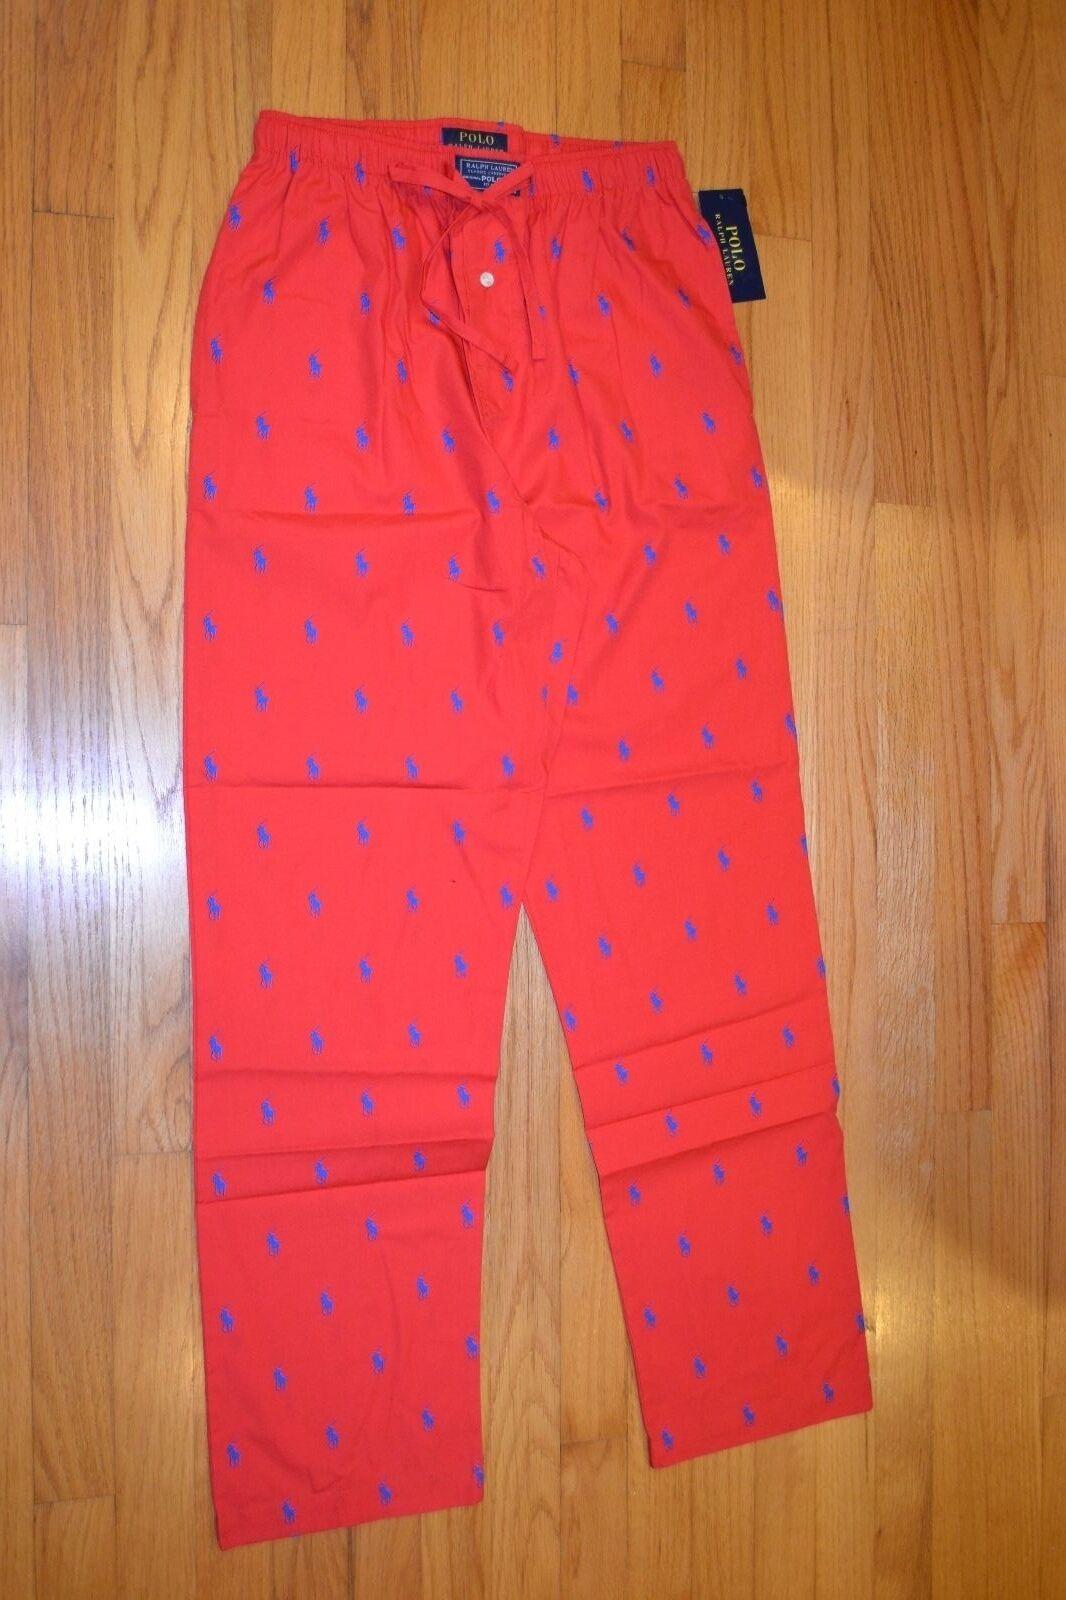 Men's Polo Ralph Lauren Sleepwear Red Pajamas Pants Size  Medium New With Tag